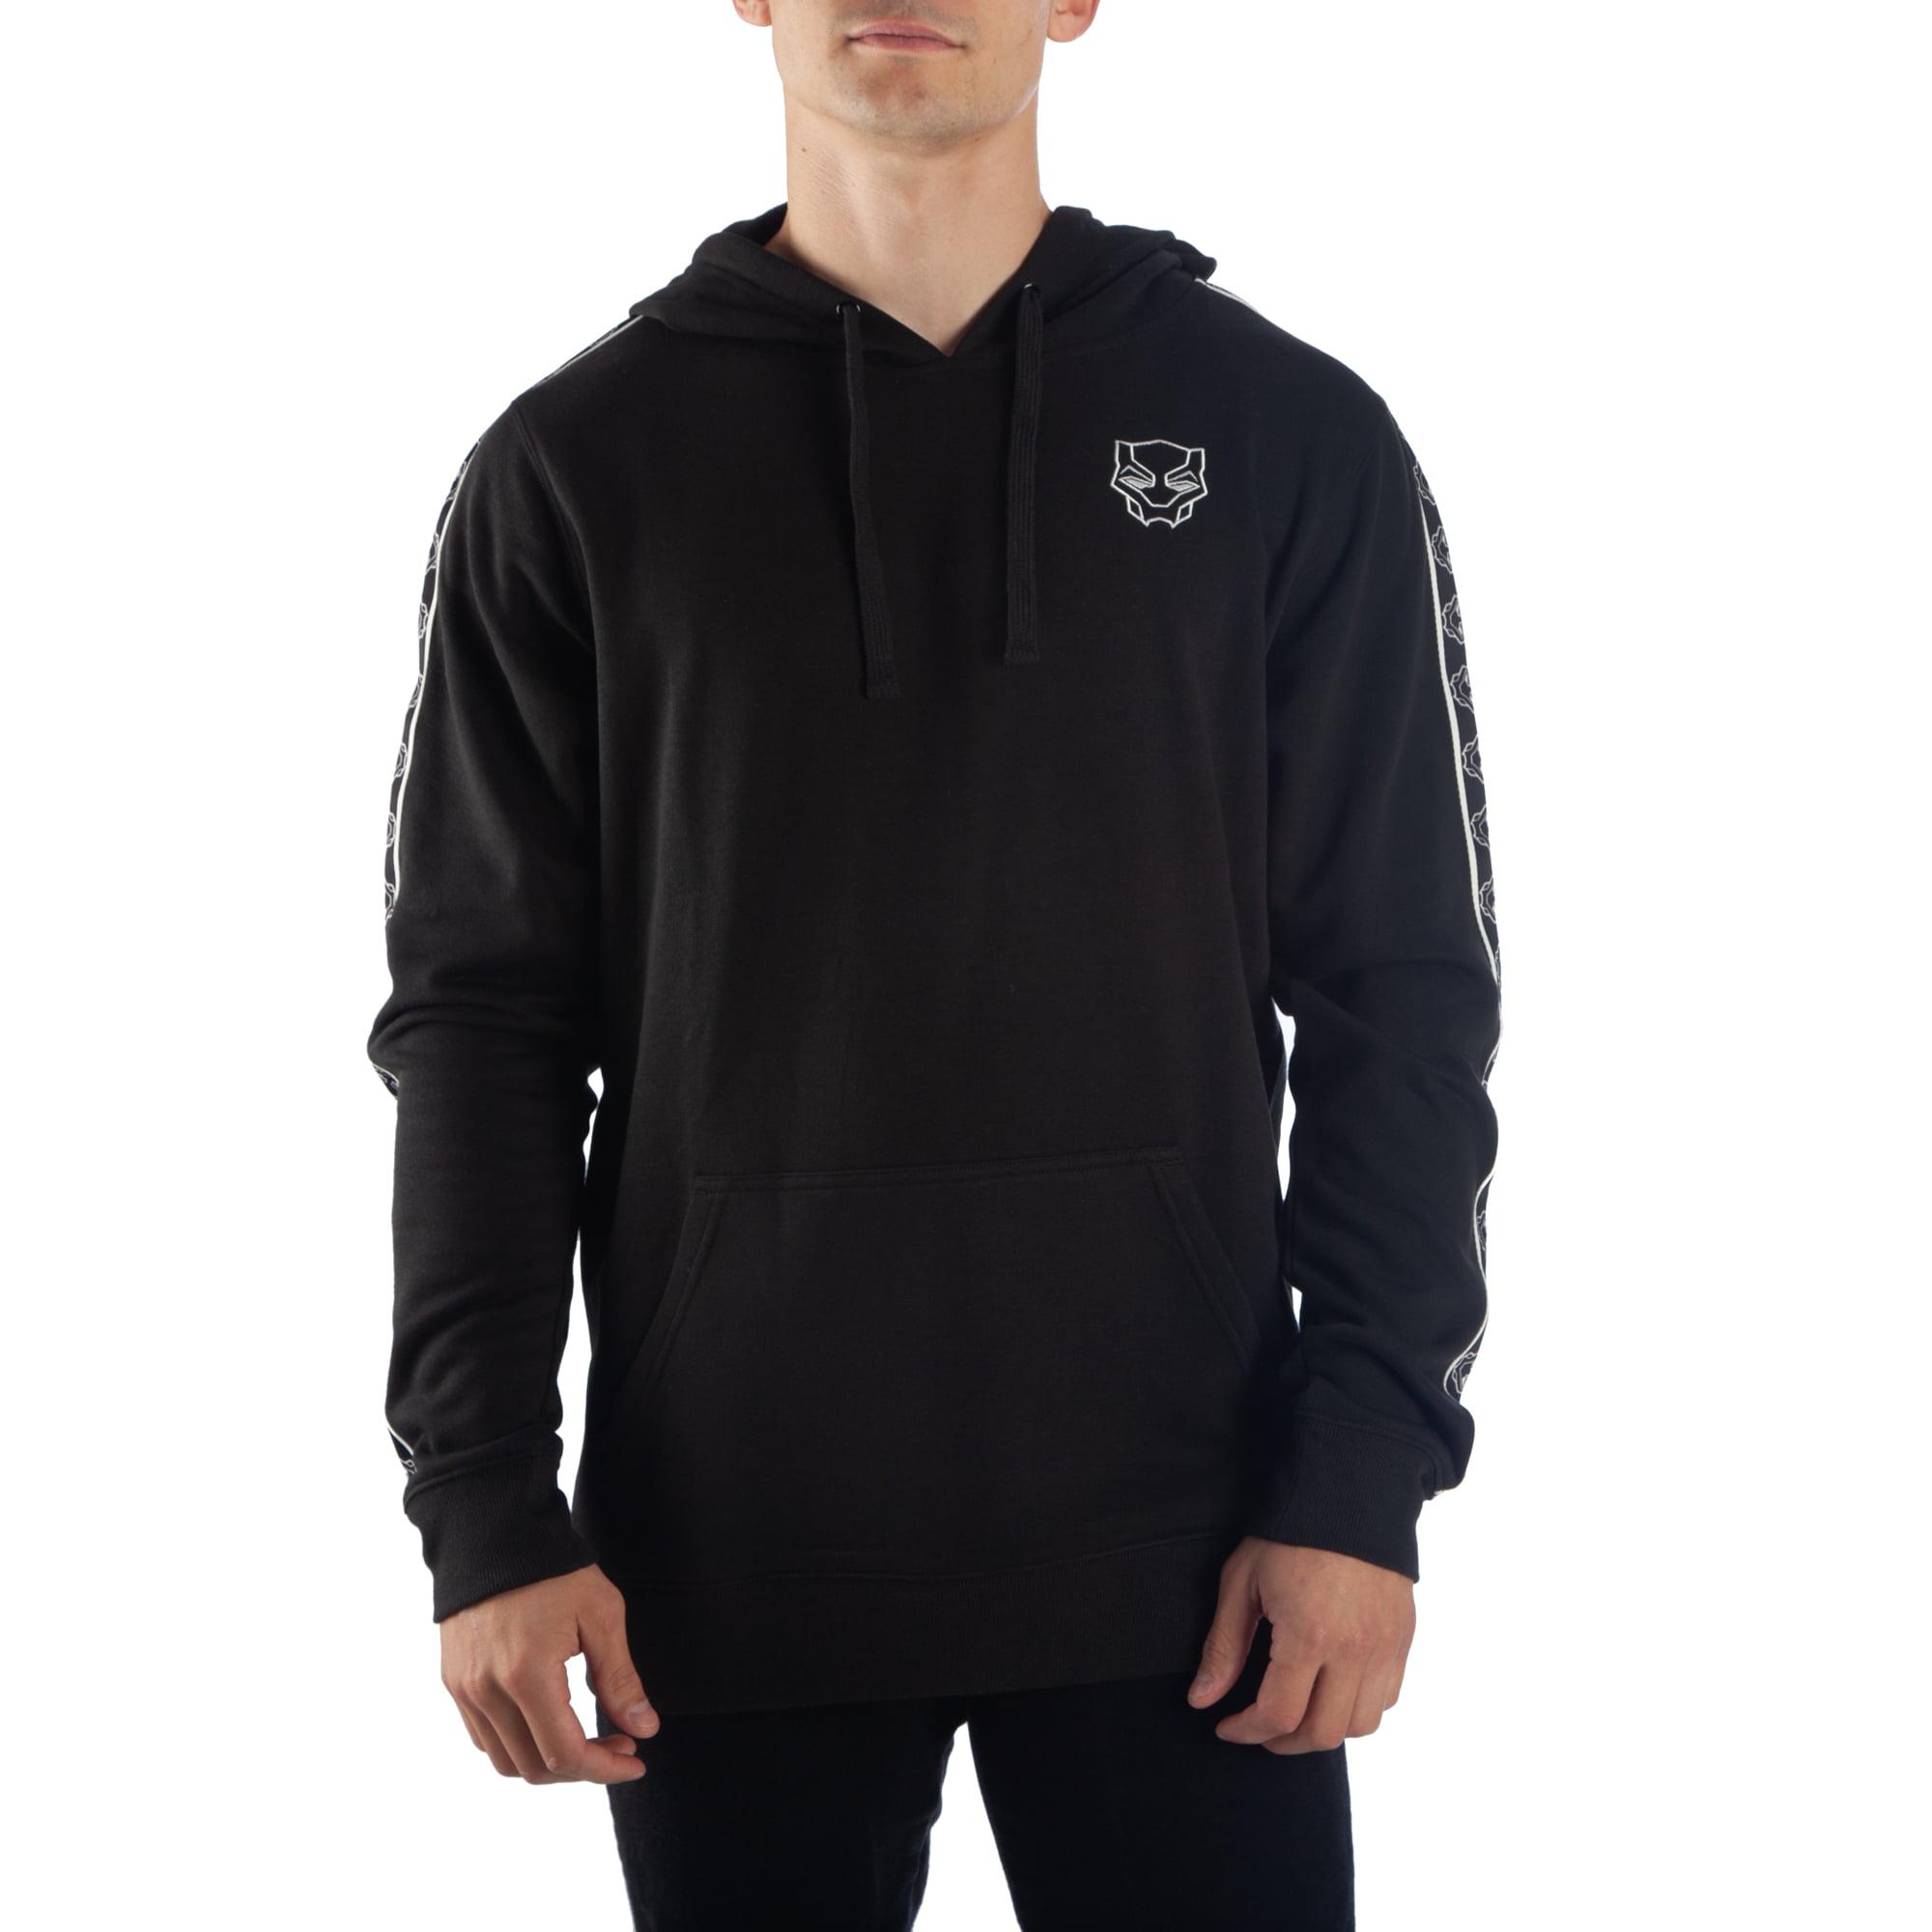 SEAT Zip Hoodie EMBROIDERED Auto Car Logo Sweat Sweatshirt Jacket Hoody Mens